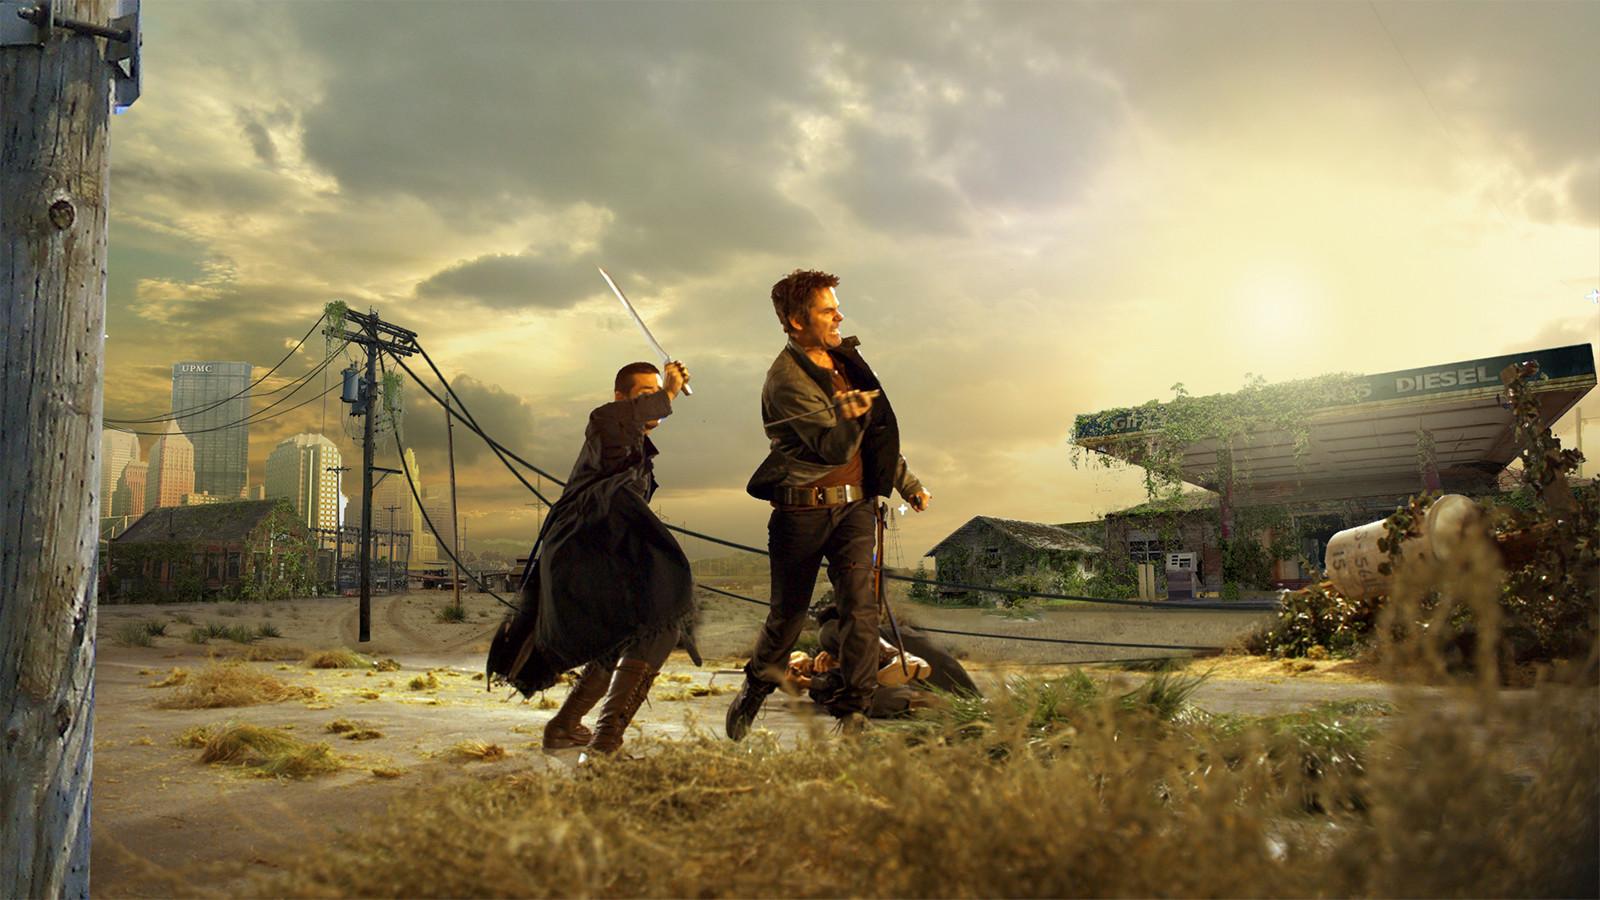 NBC 'Revolution' Promo Mattepaintings The Mill LA